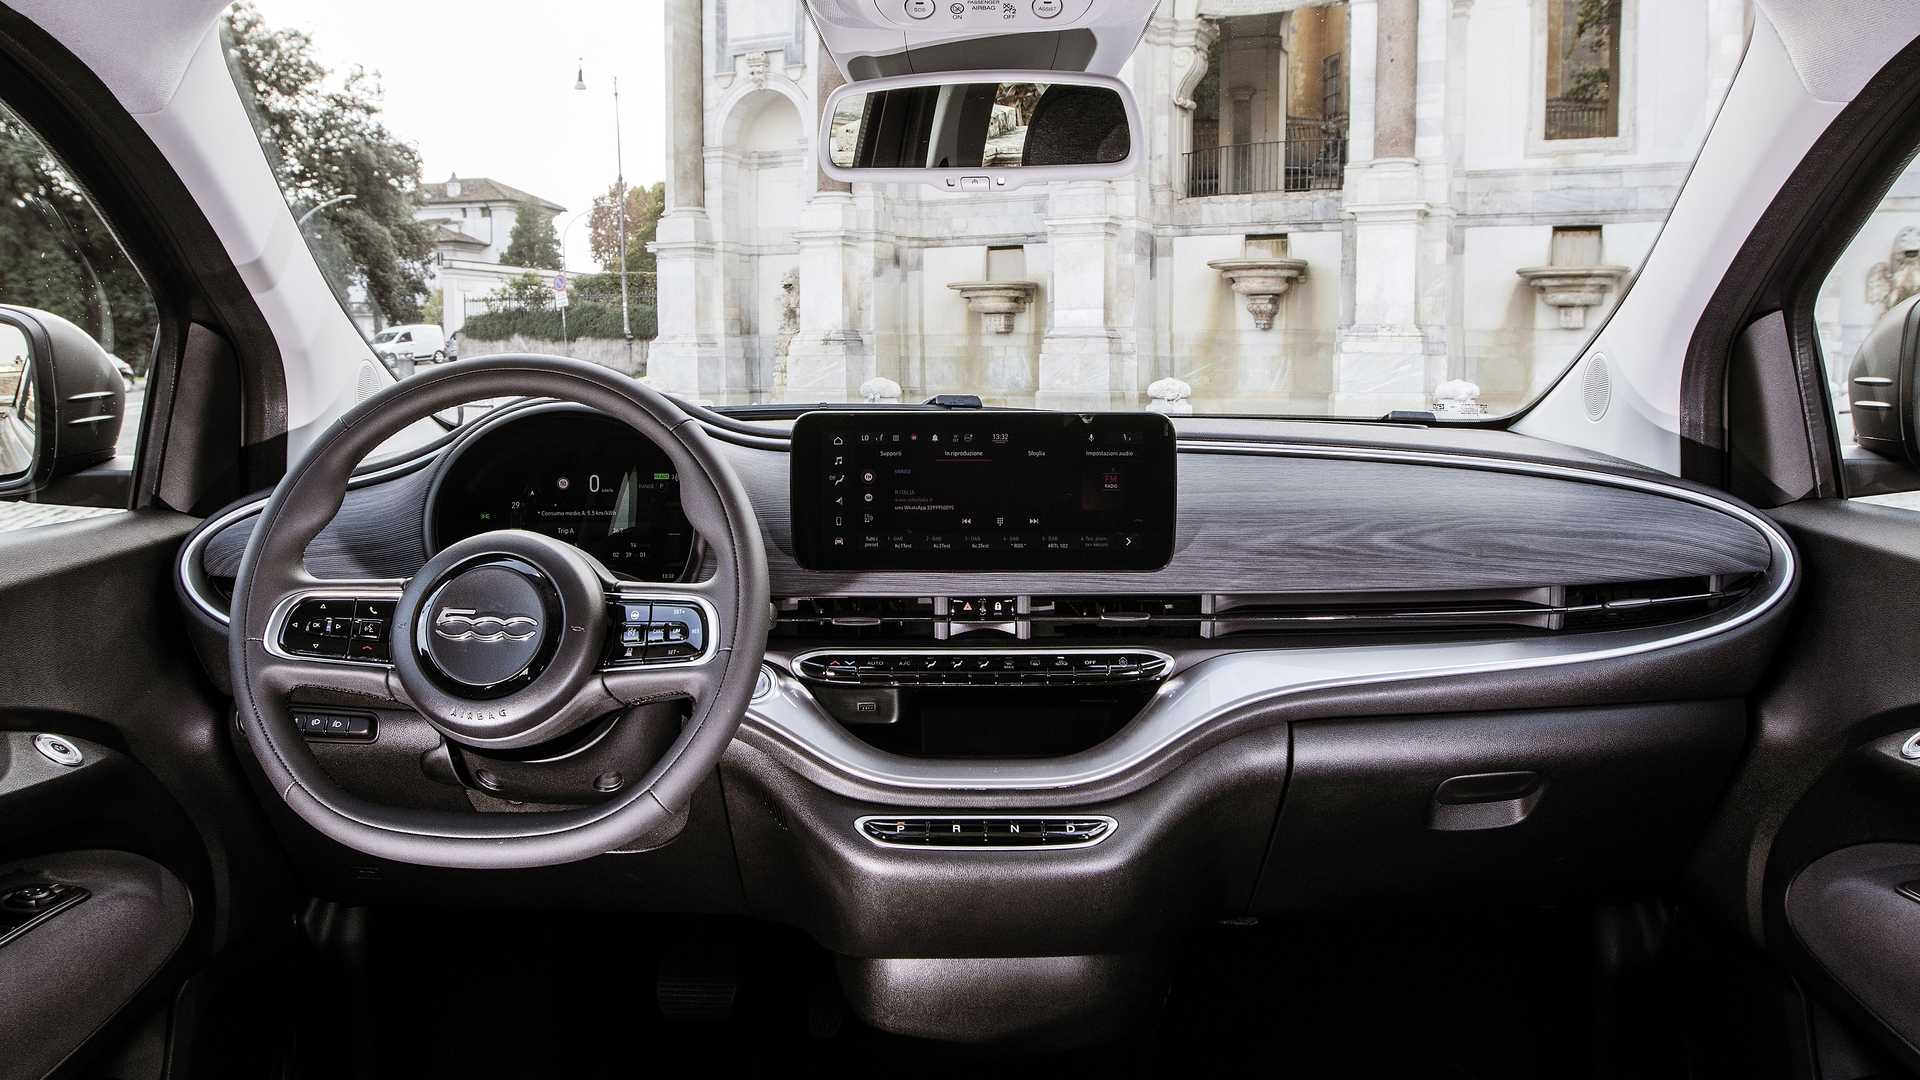 Fiat 500 - Cabin